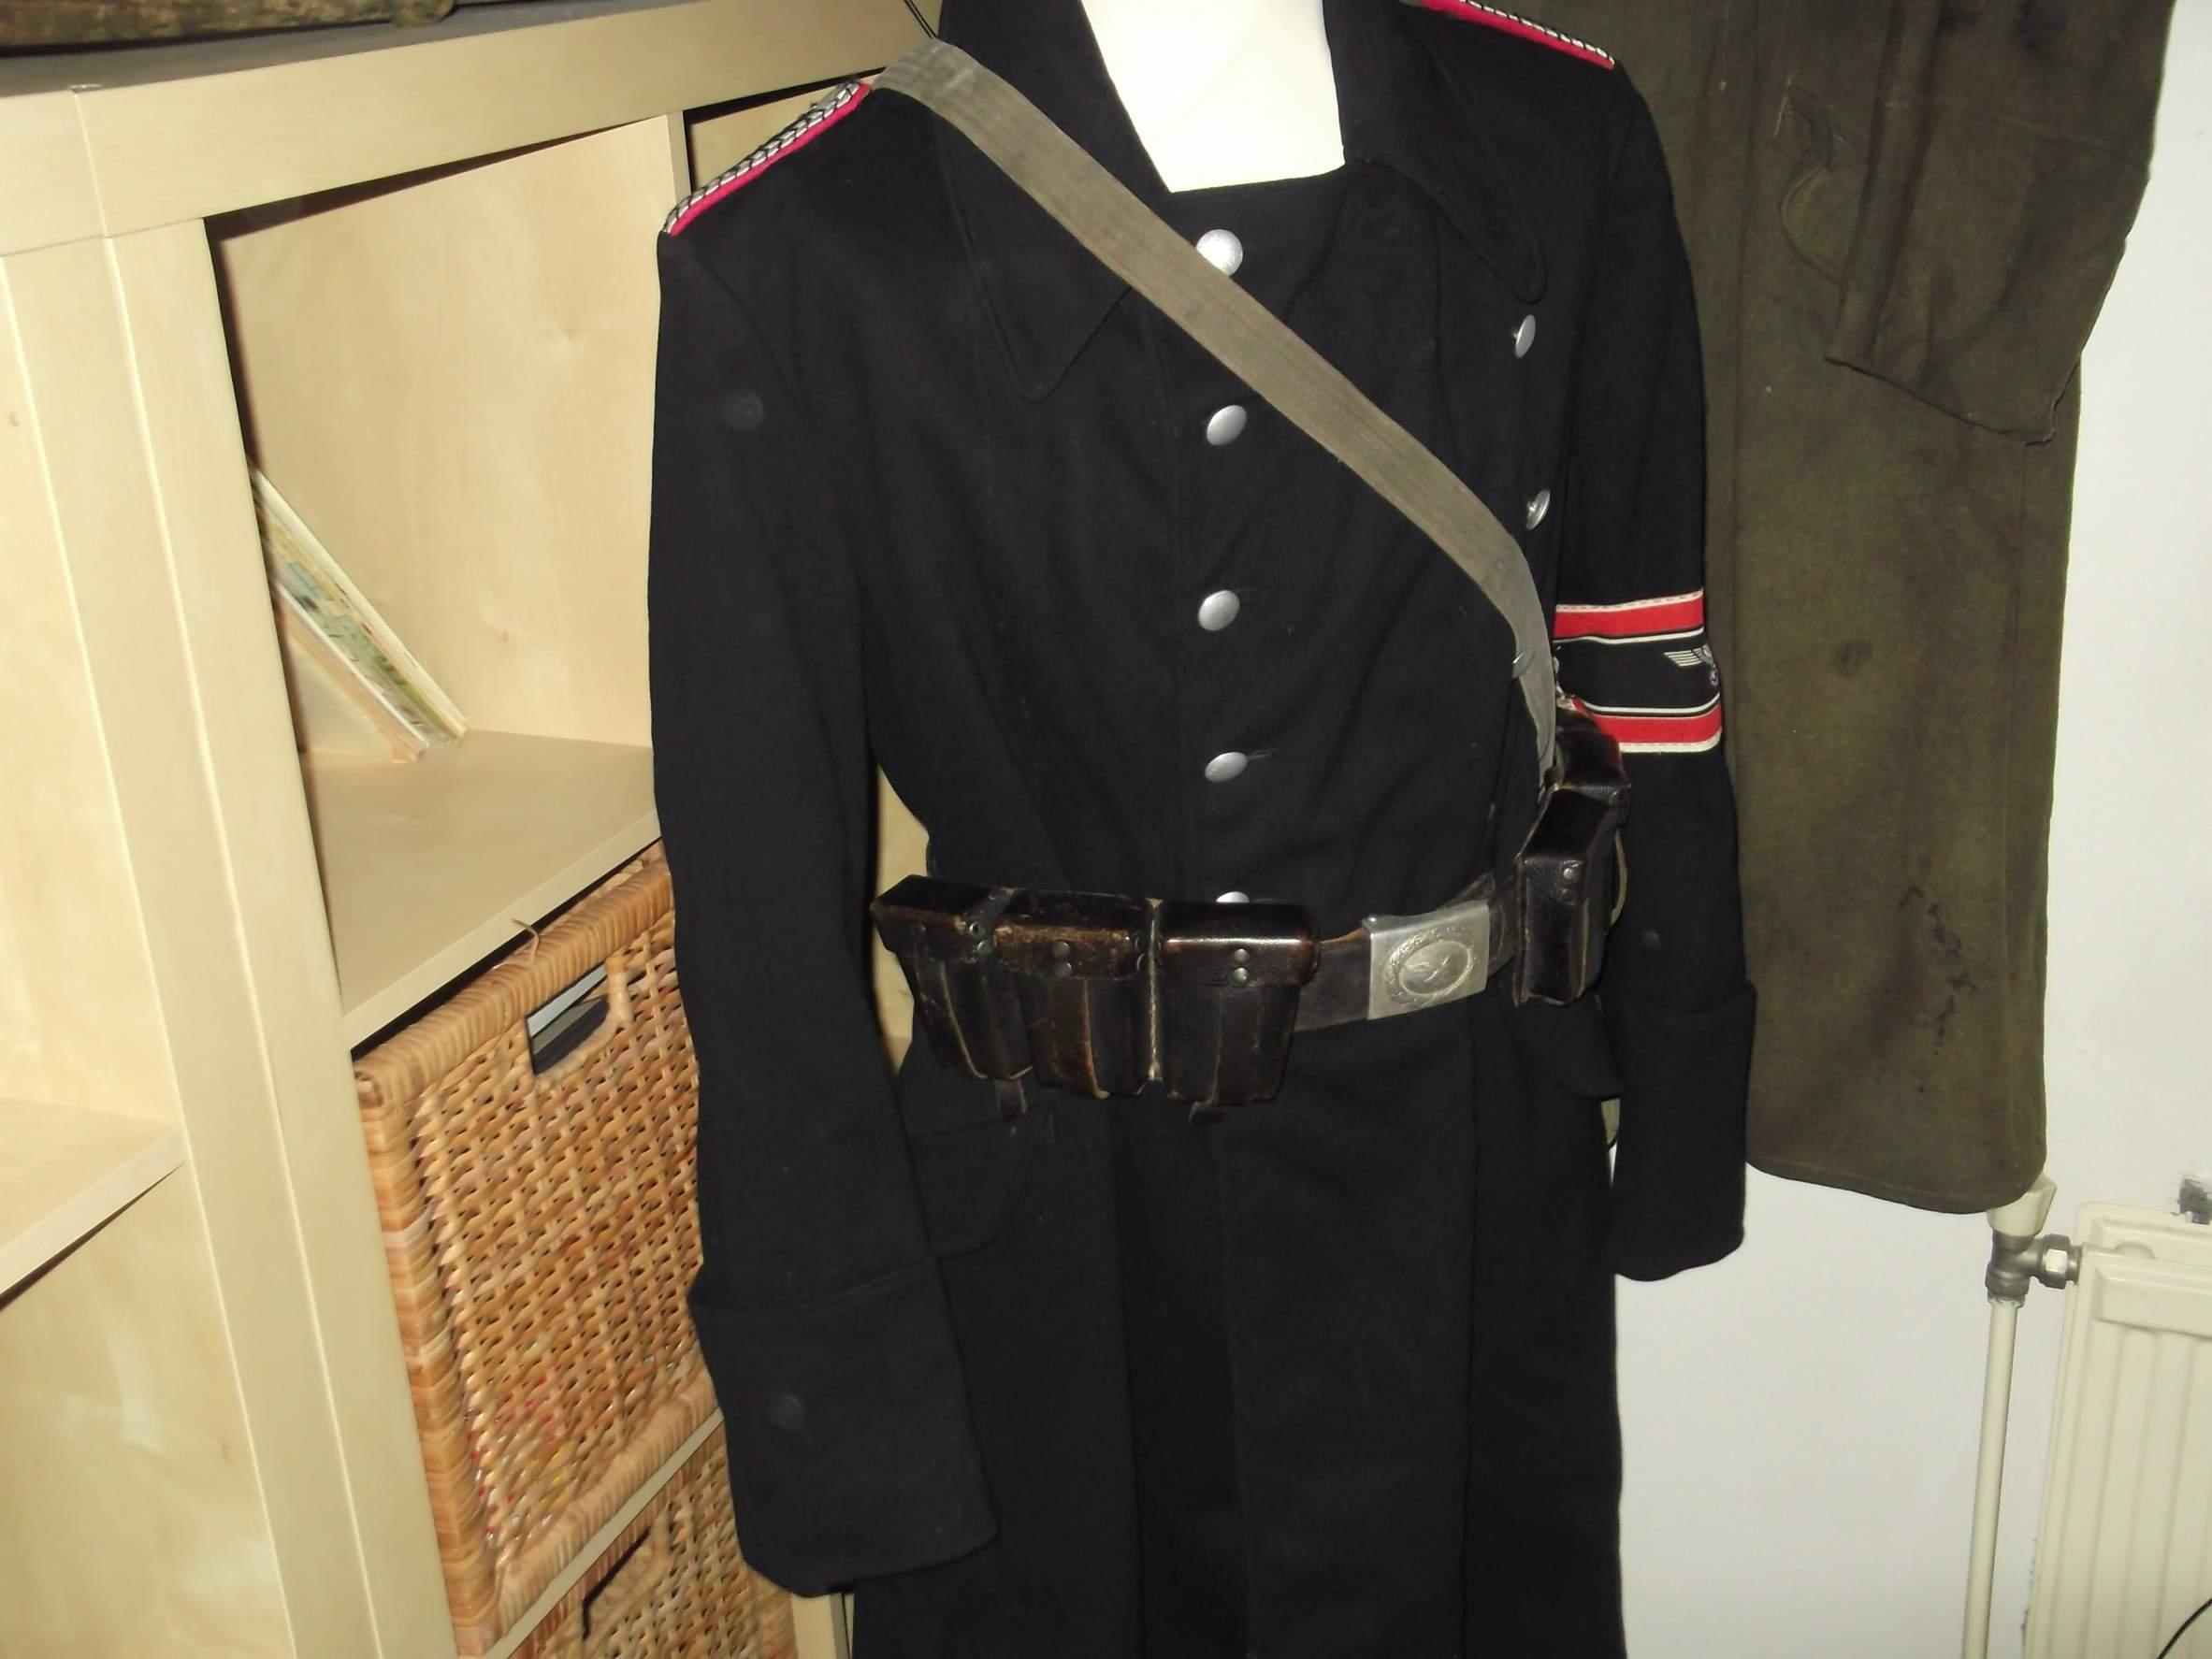 mantel polizei 1933